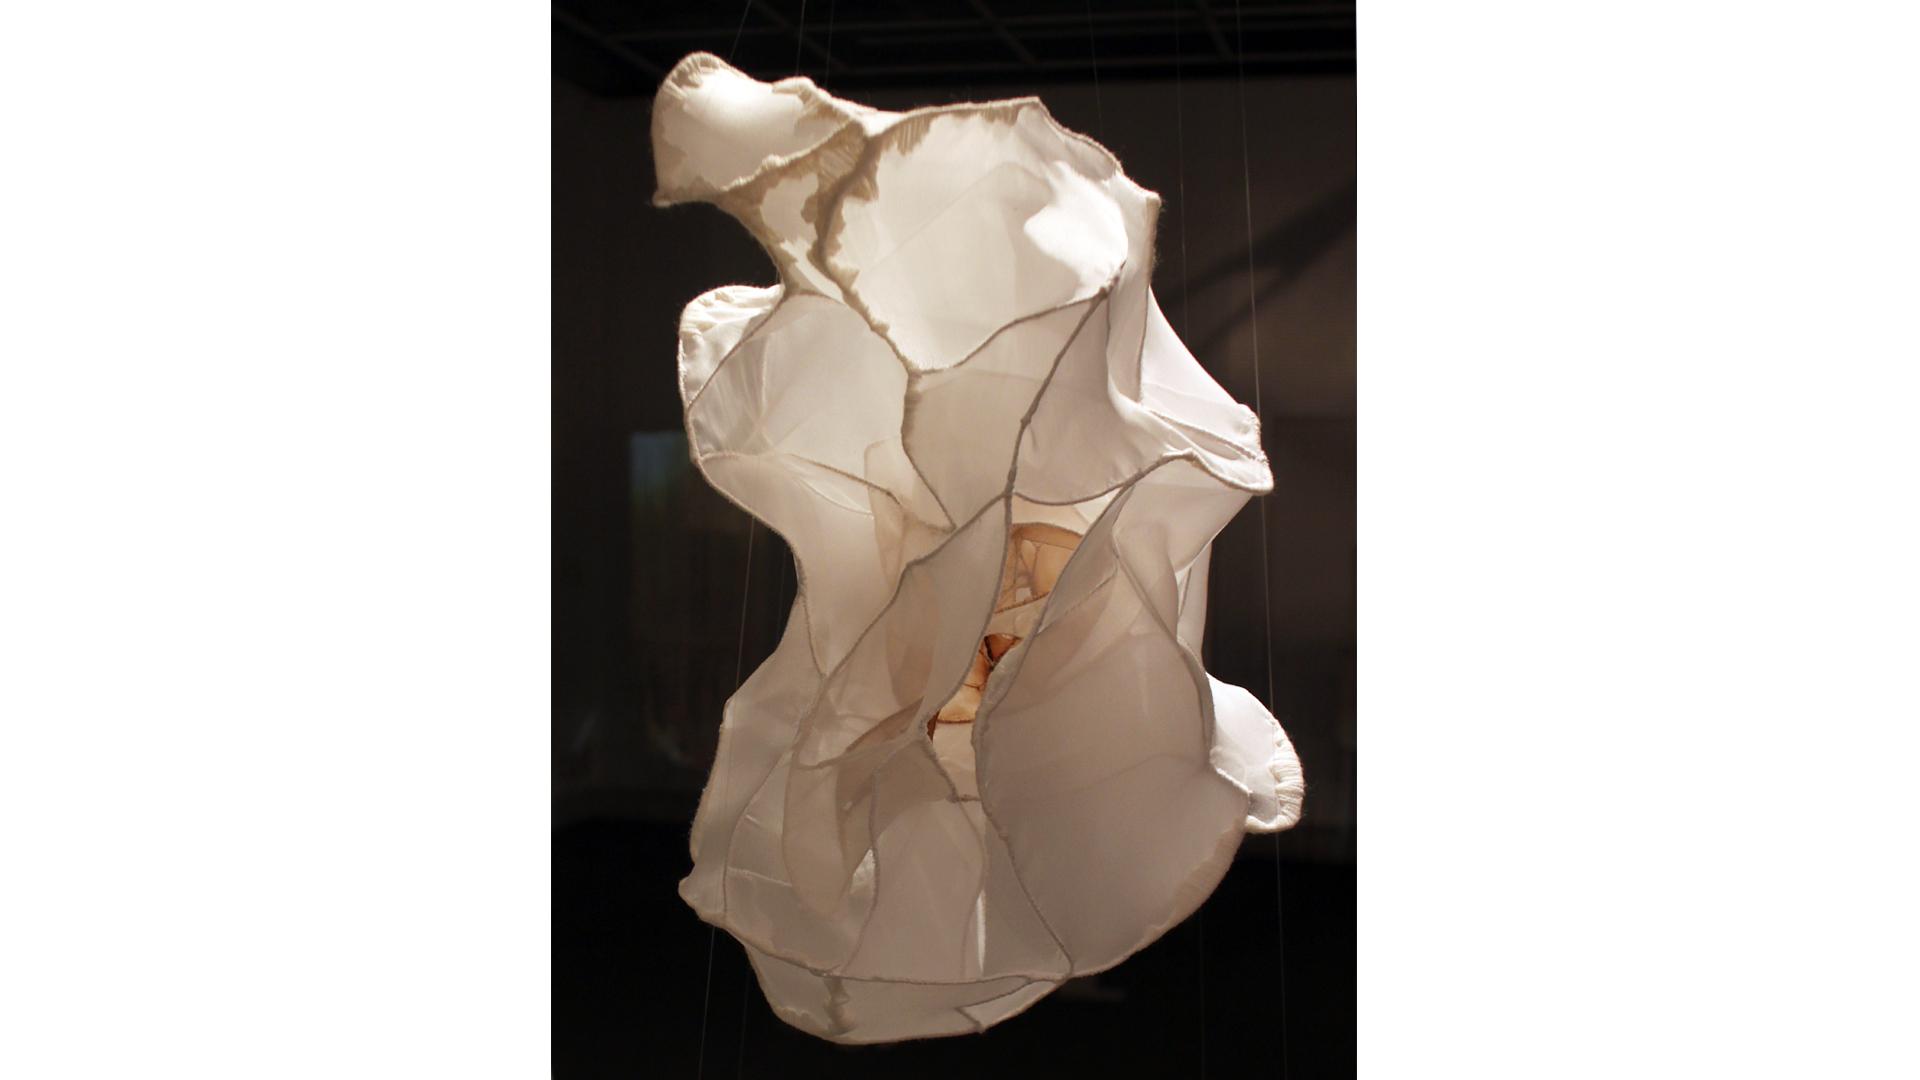 Anni Foglert skulptur